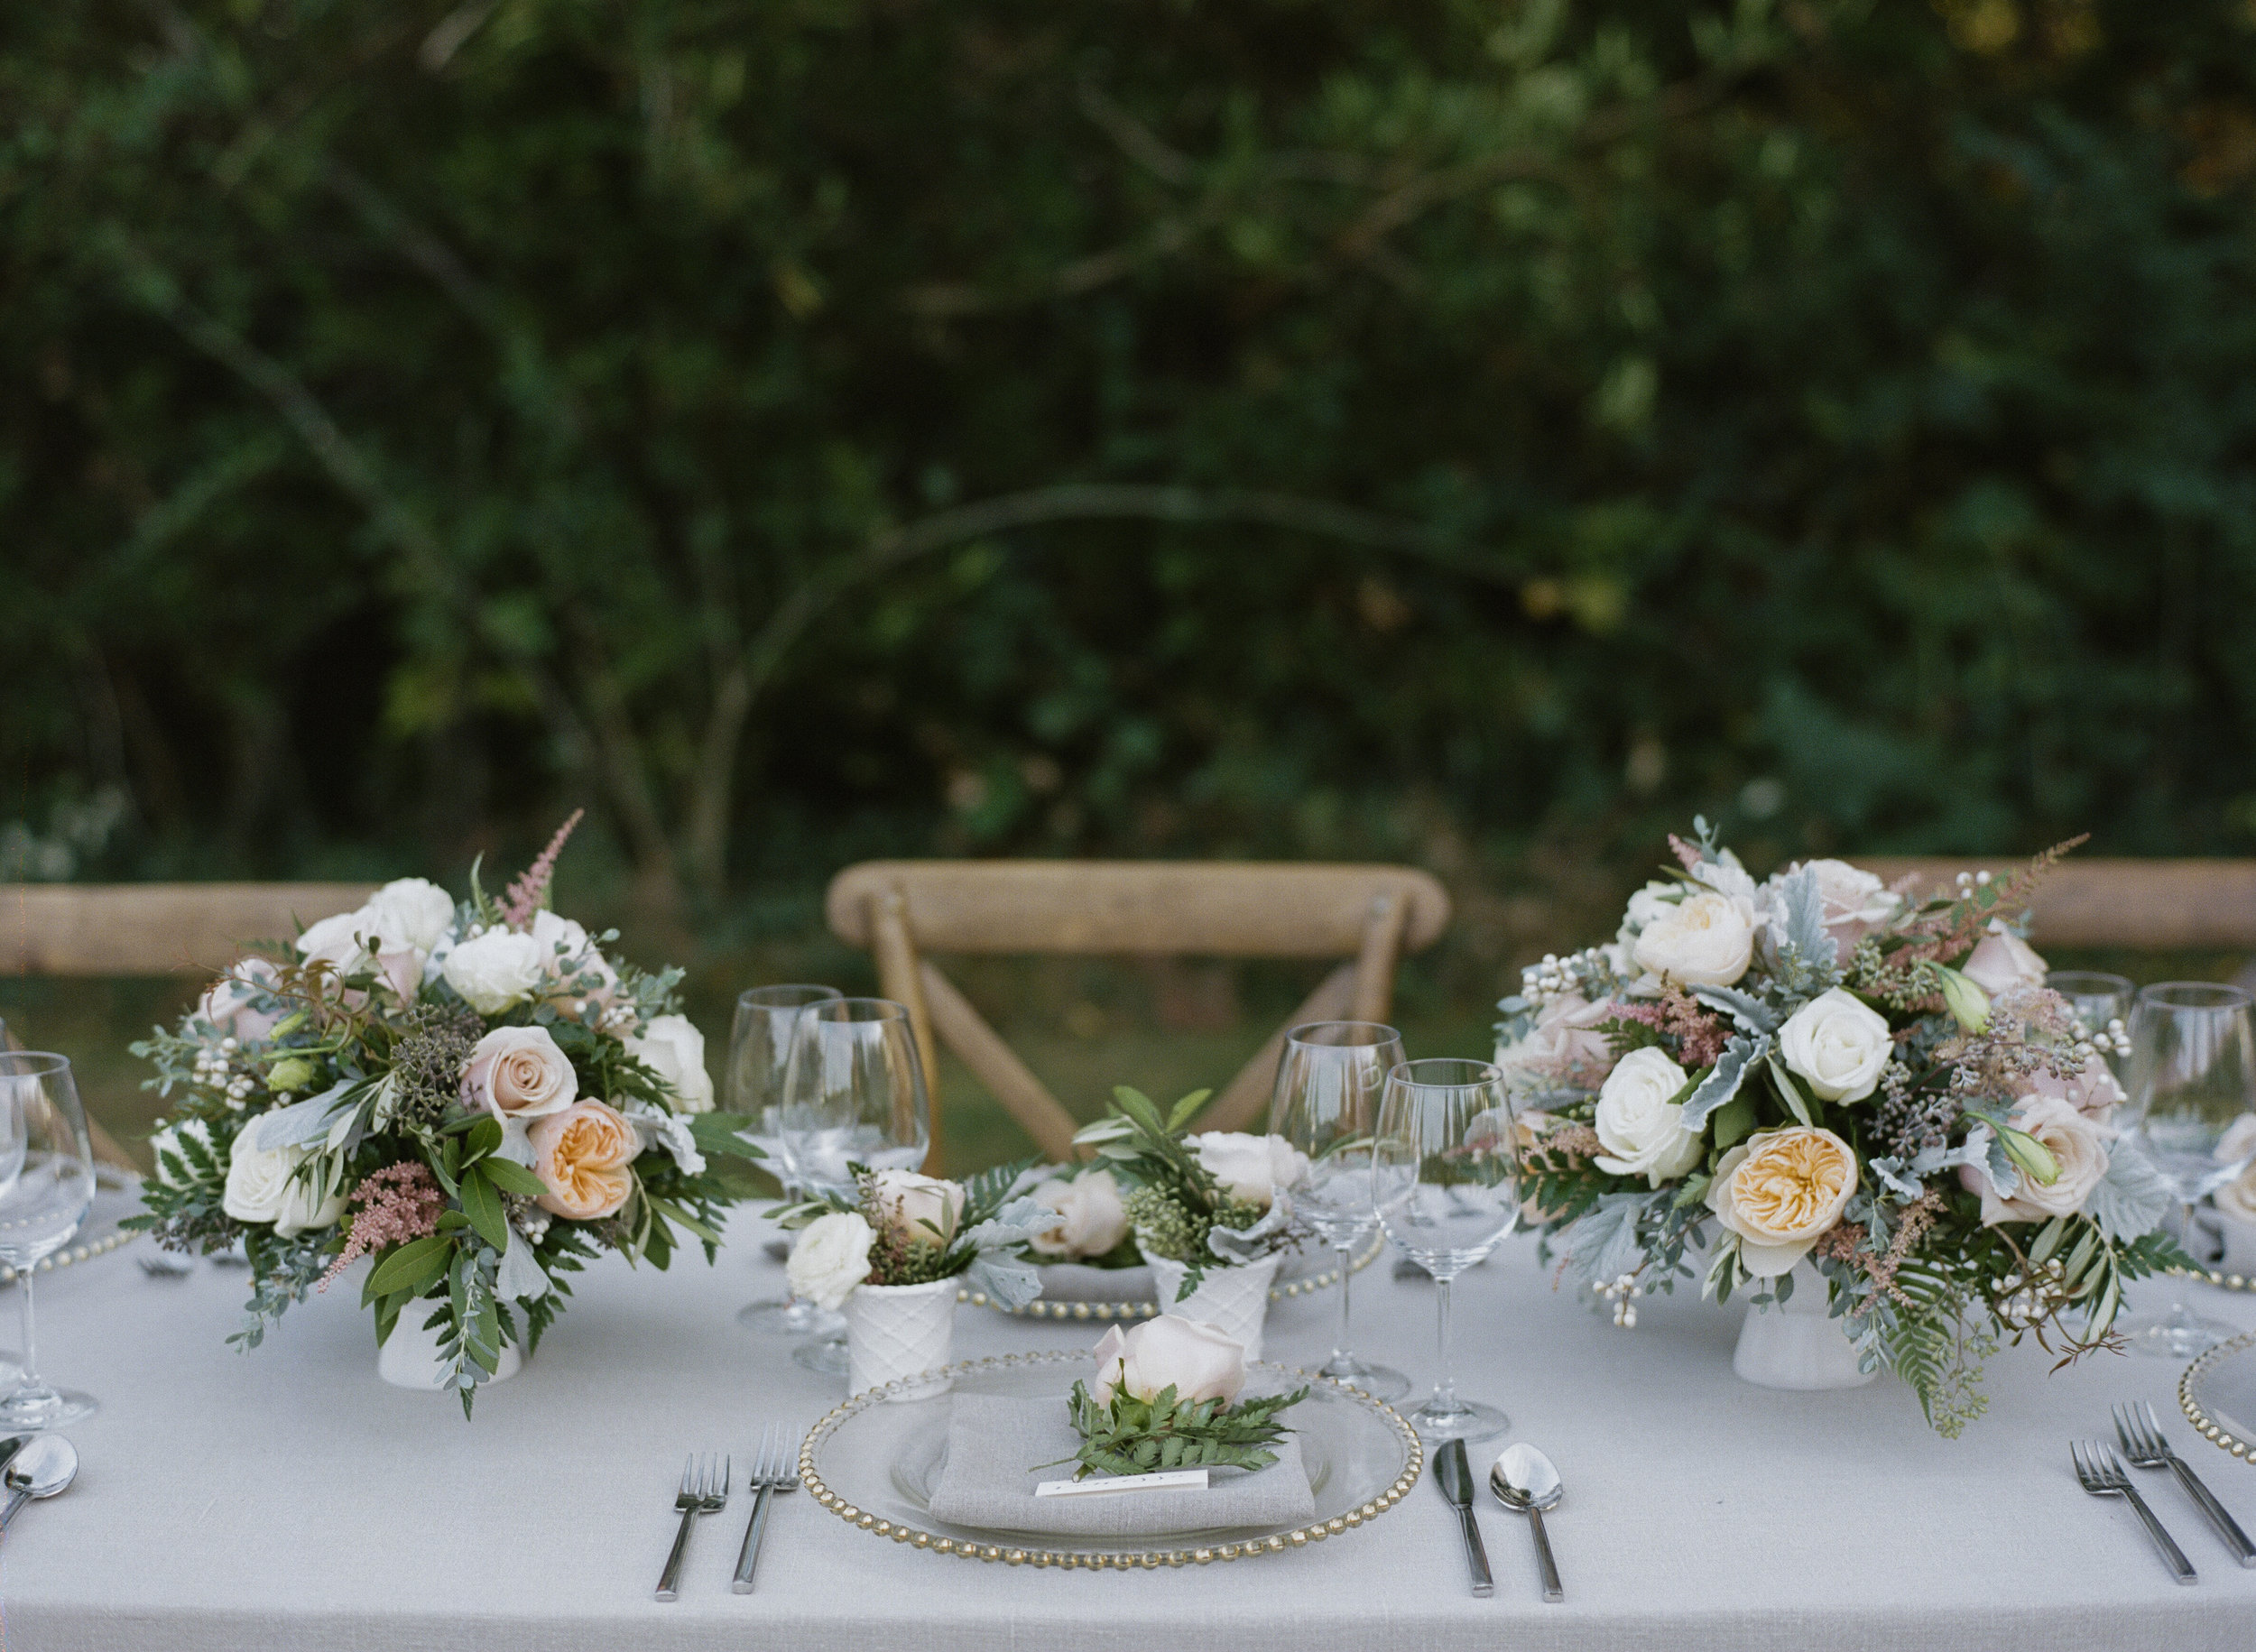 Violette-fleurs-roseville-sacramento-california-Flower-farm-inn-wedding-florist-spring-tablescape-blush-peach.jpg